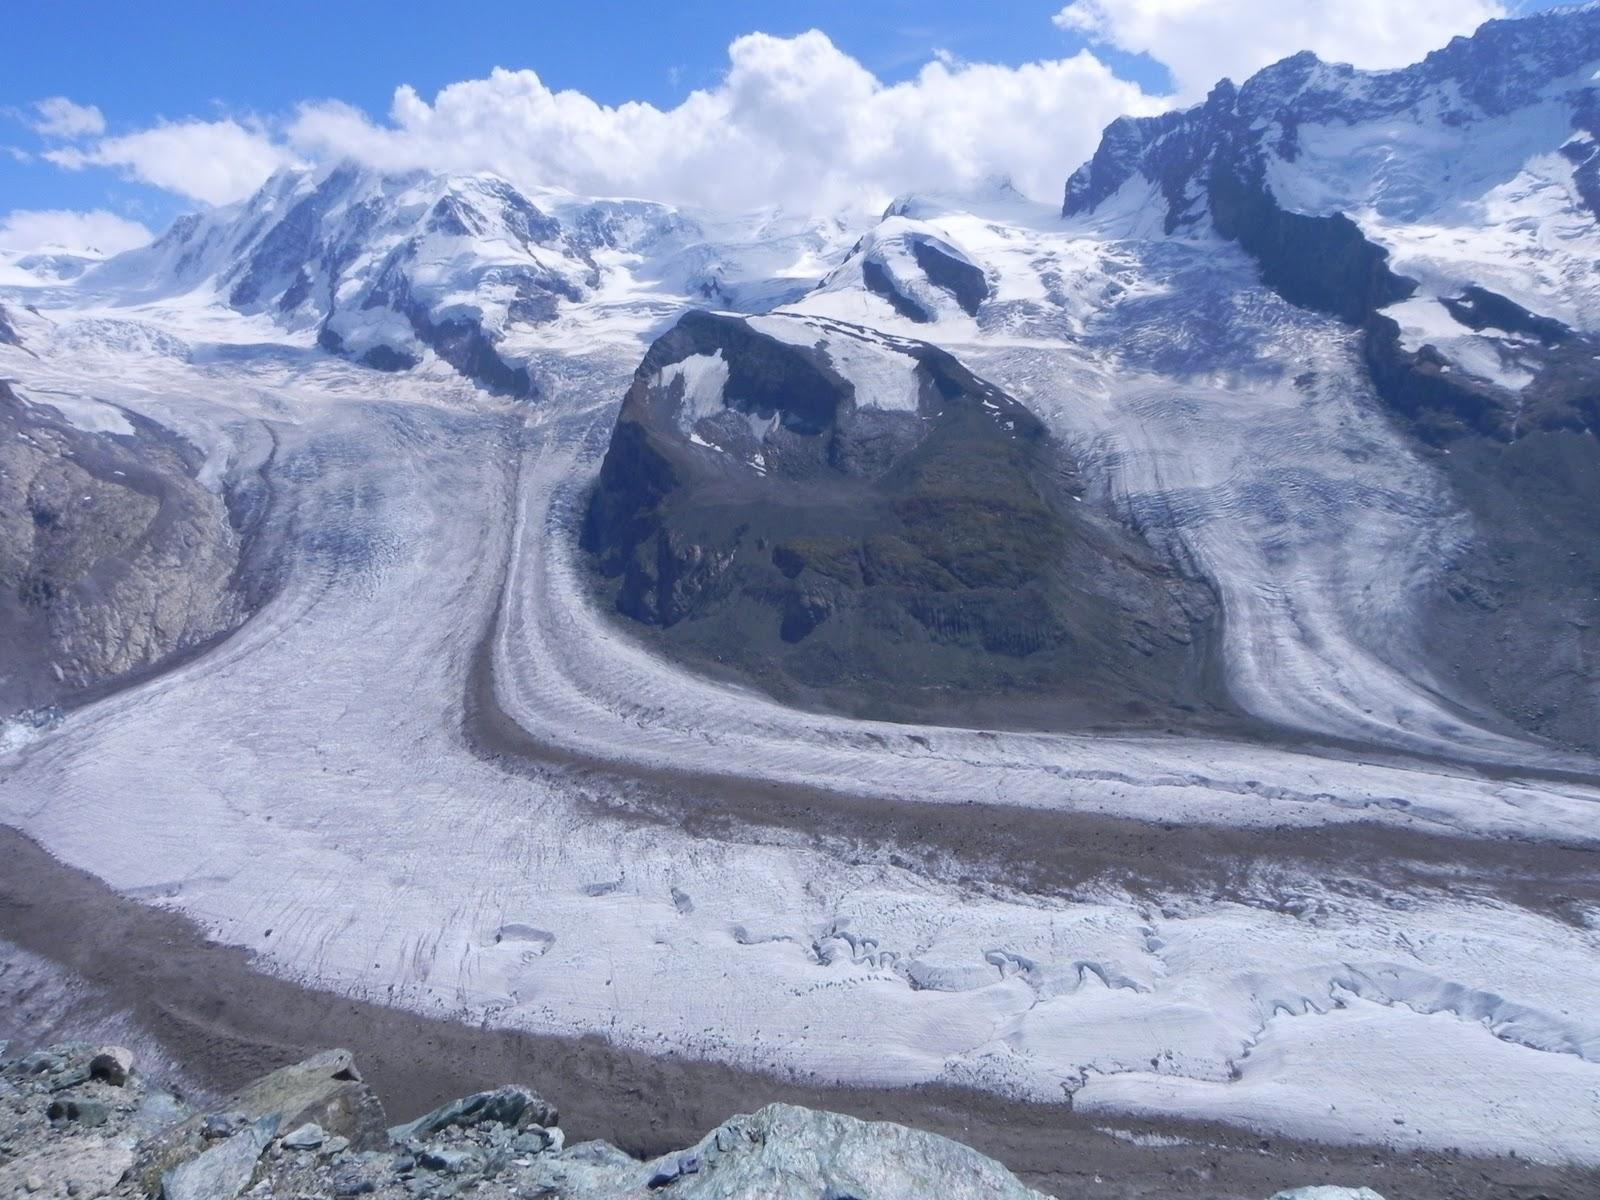 external image 164.-+Suiza.+Agosto+2010.+Zermatt.+Gornergrat+%25282%2529.JPG